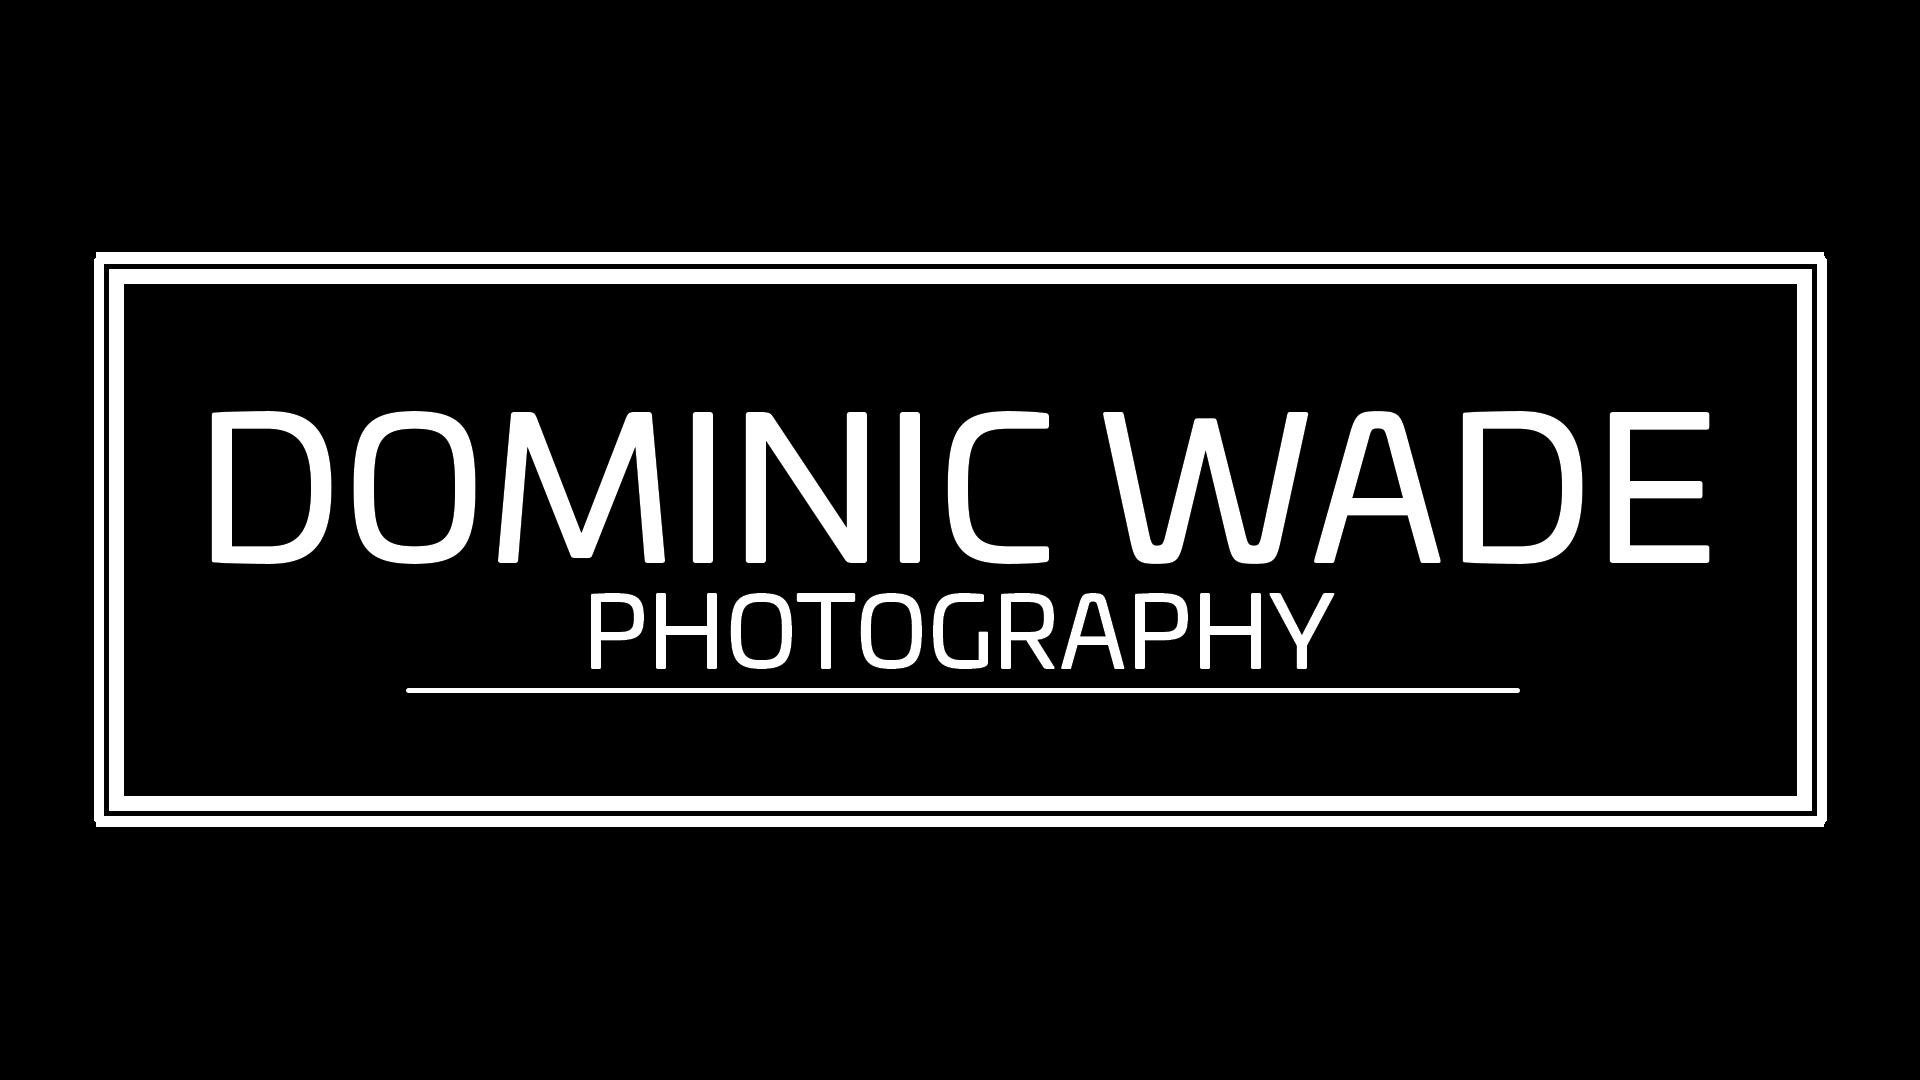 Dominic Wade